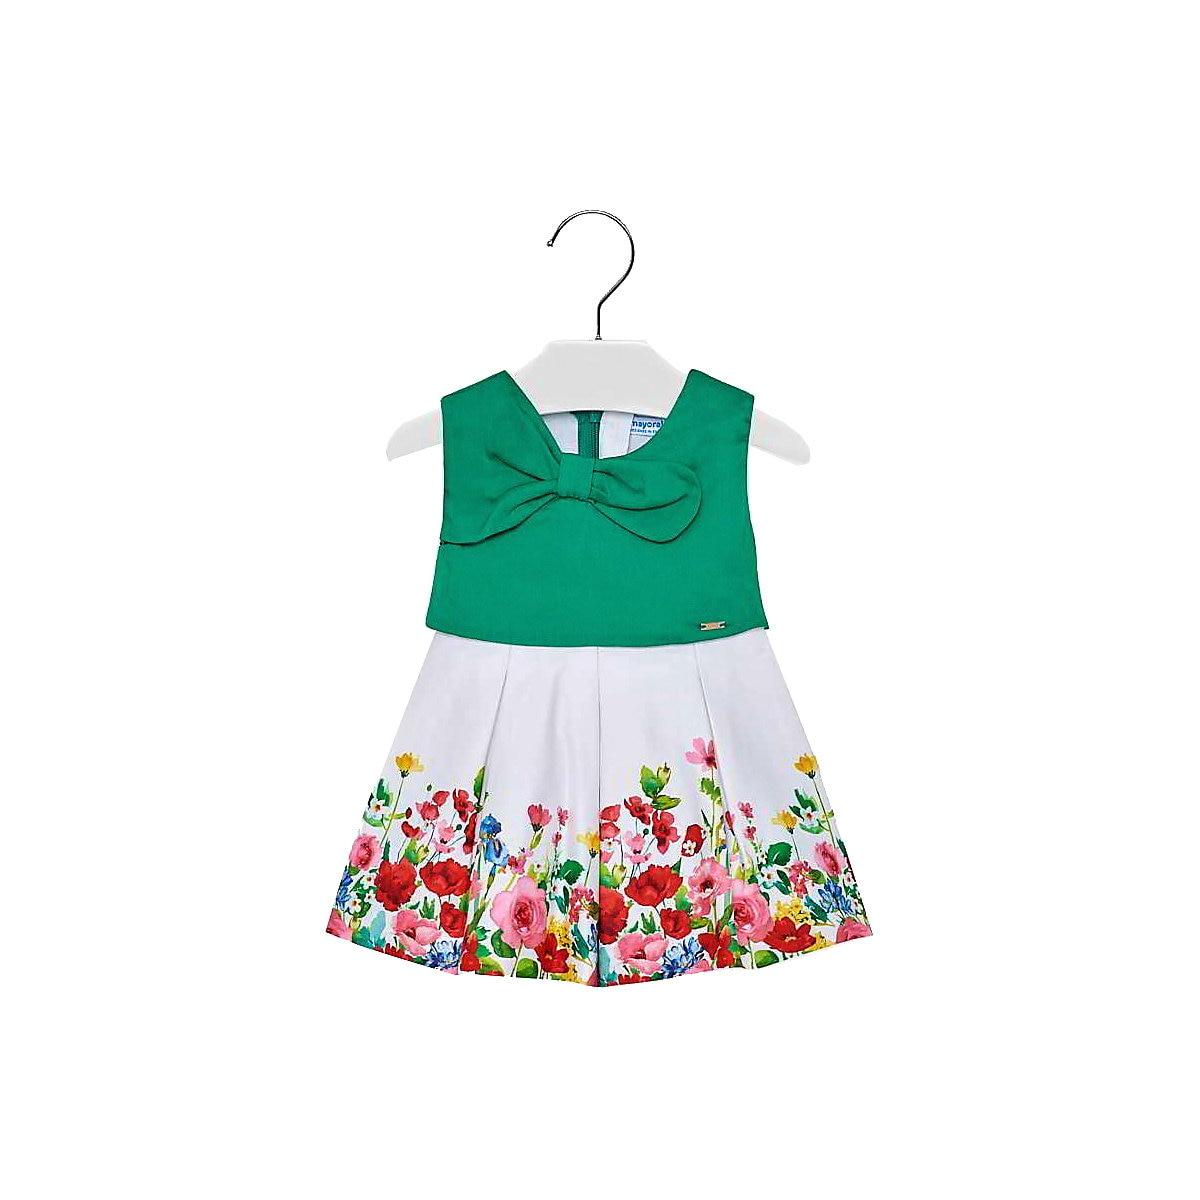 MAYORAL Dresses 10685252 dress for girls baby clothing fashion slim family long sleeve mesh dress for girls